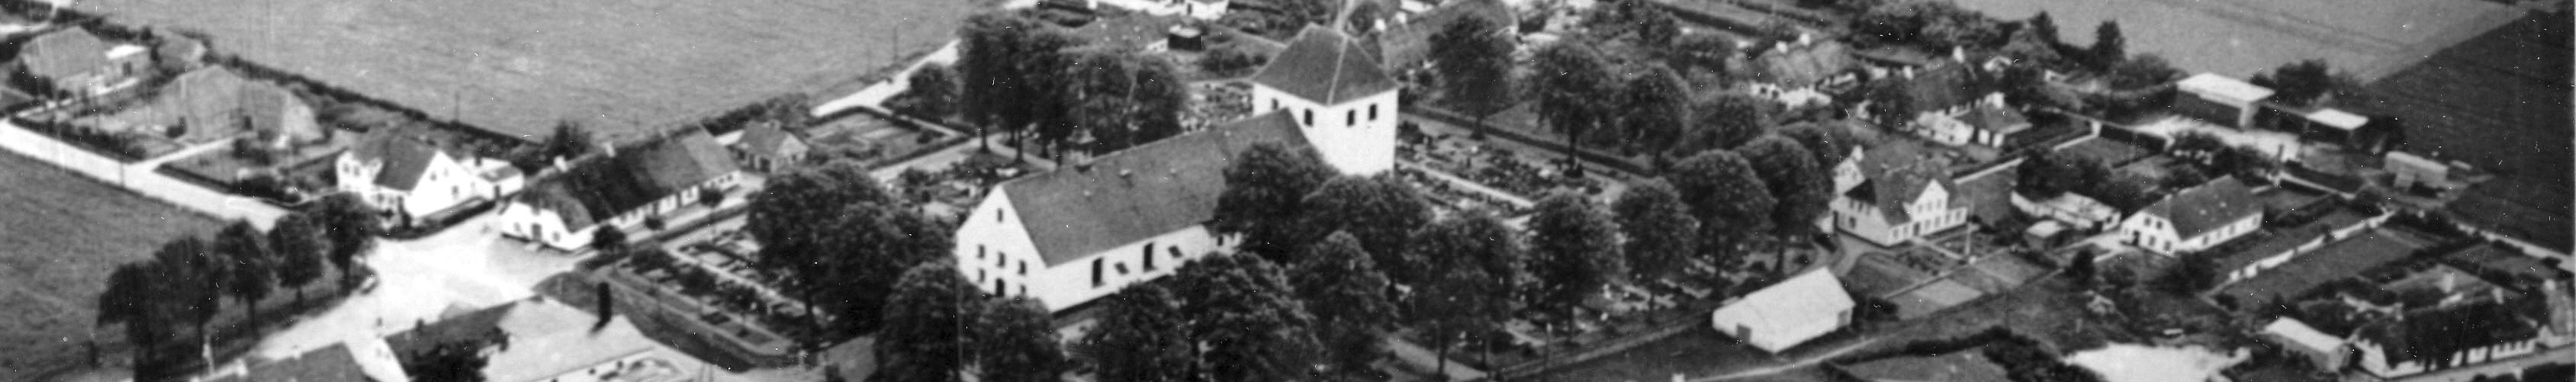 Ulkebøl Lokalhistorisk Arkiv